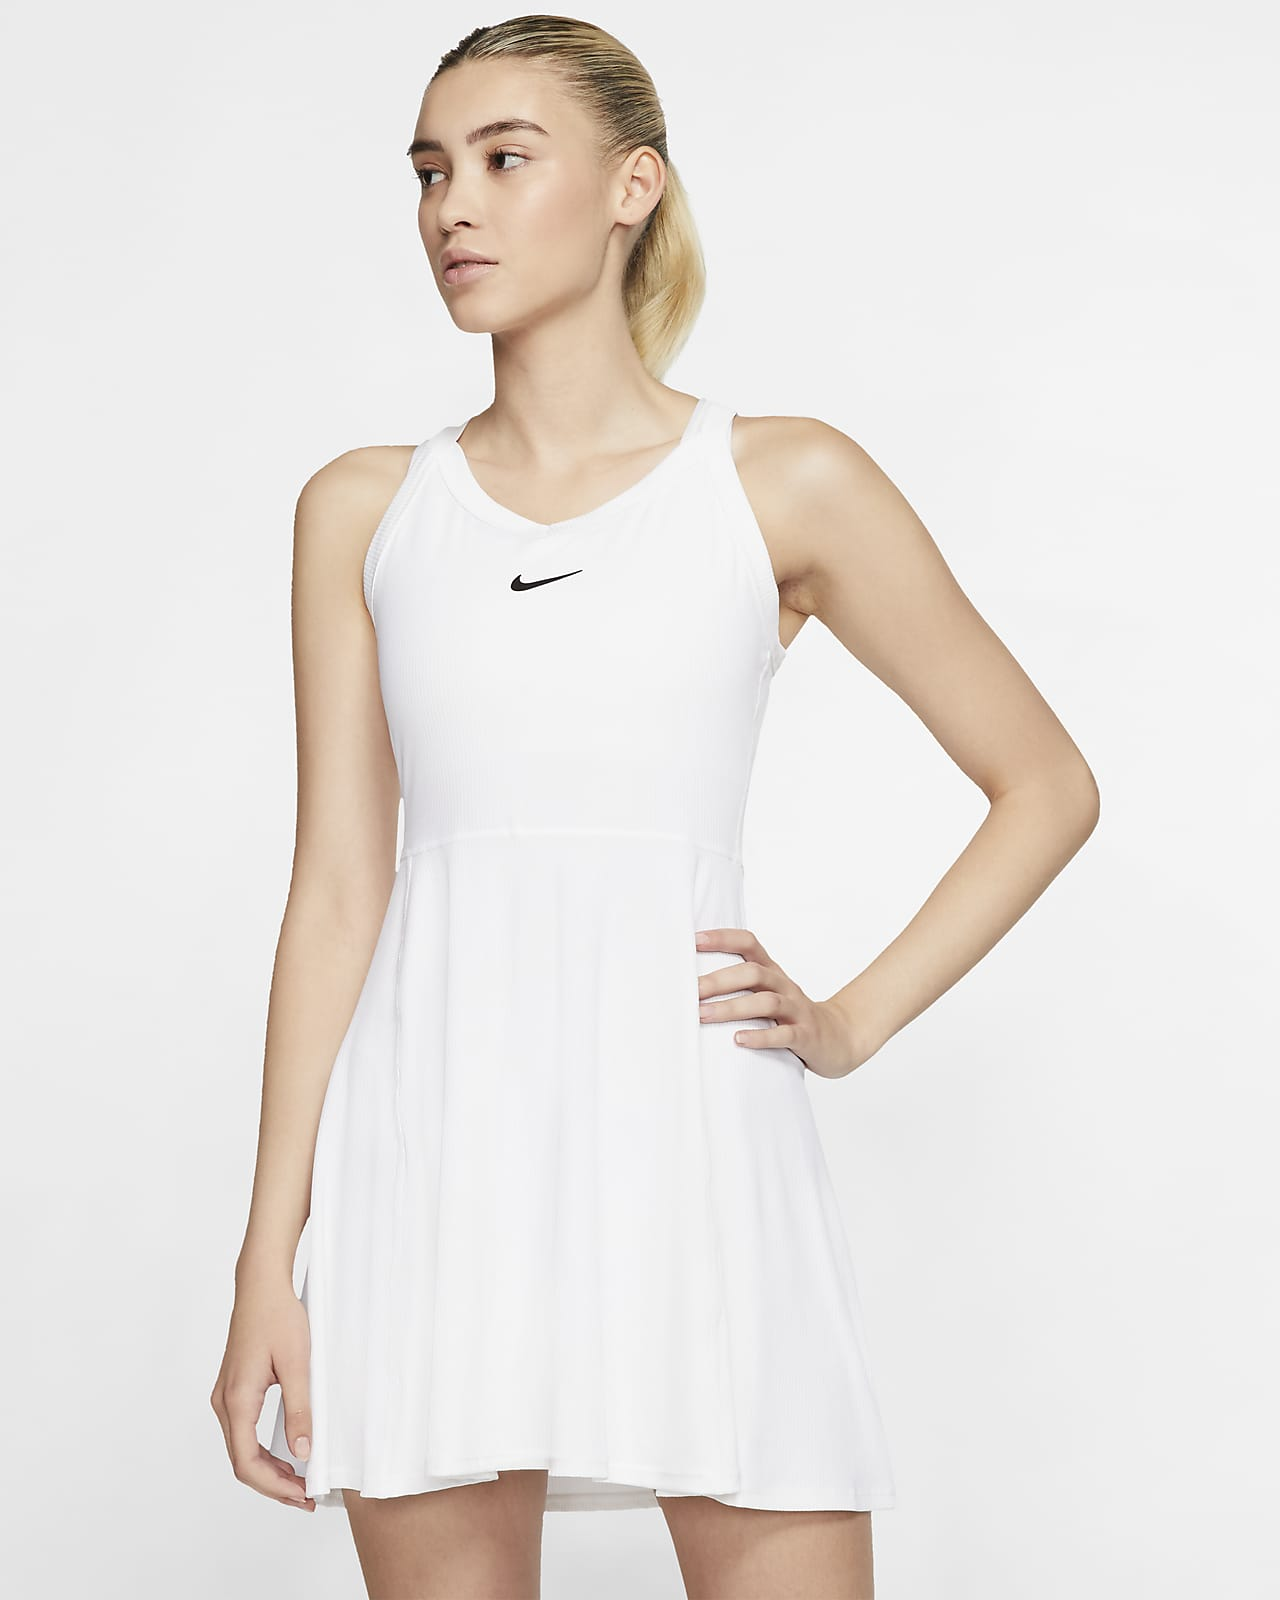 Nikecourt Dri Fit Women S Tennis Dress Nike Com